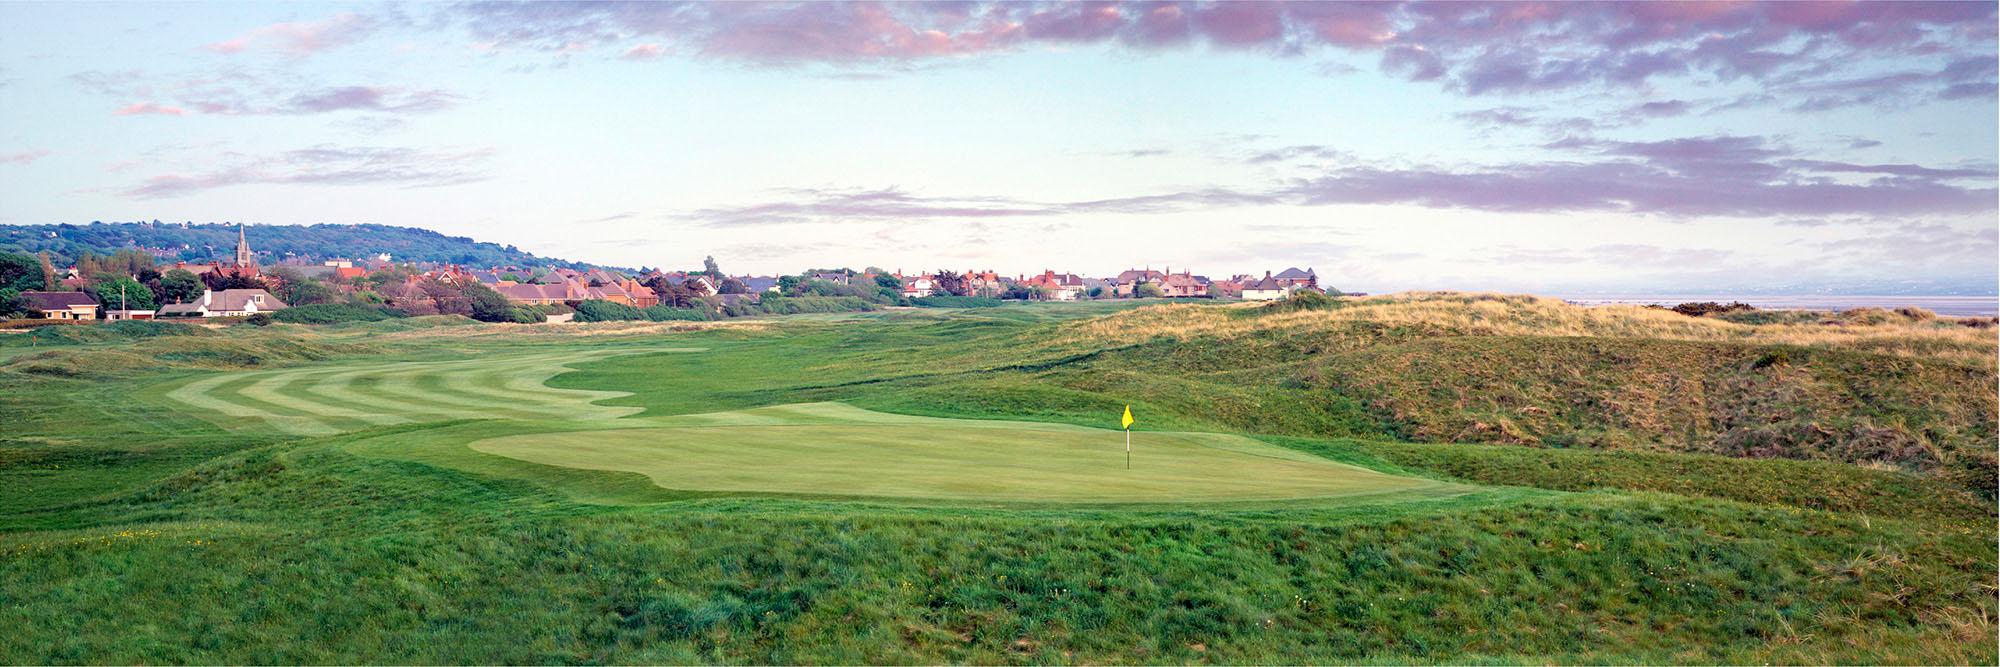 Golf Course Image - Royal Liverpool No. 10